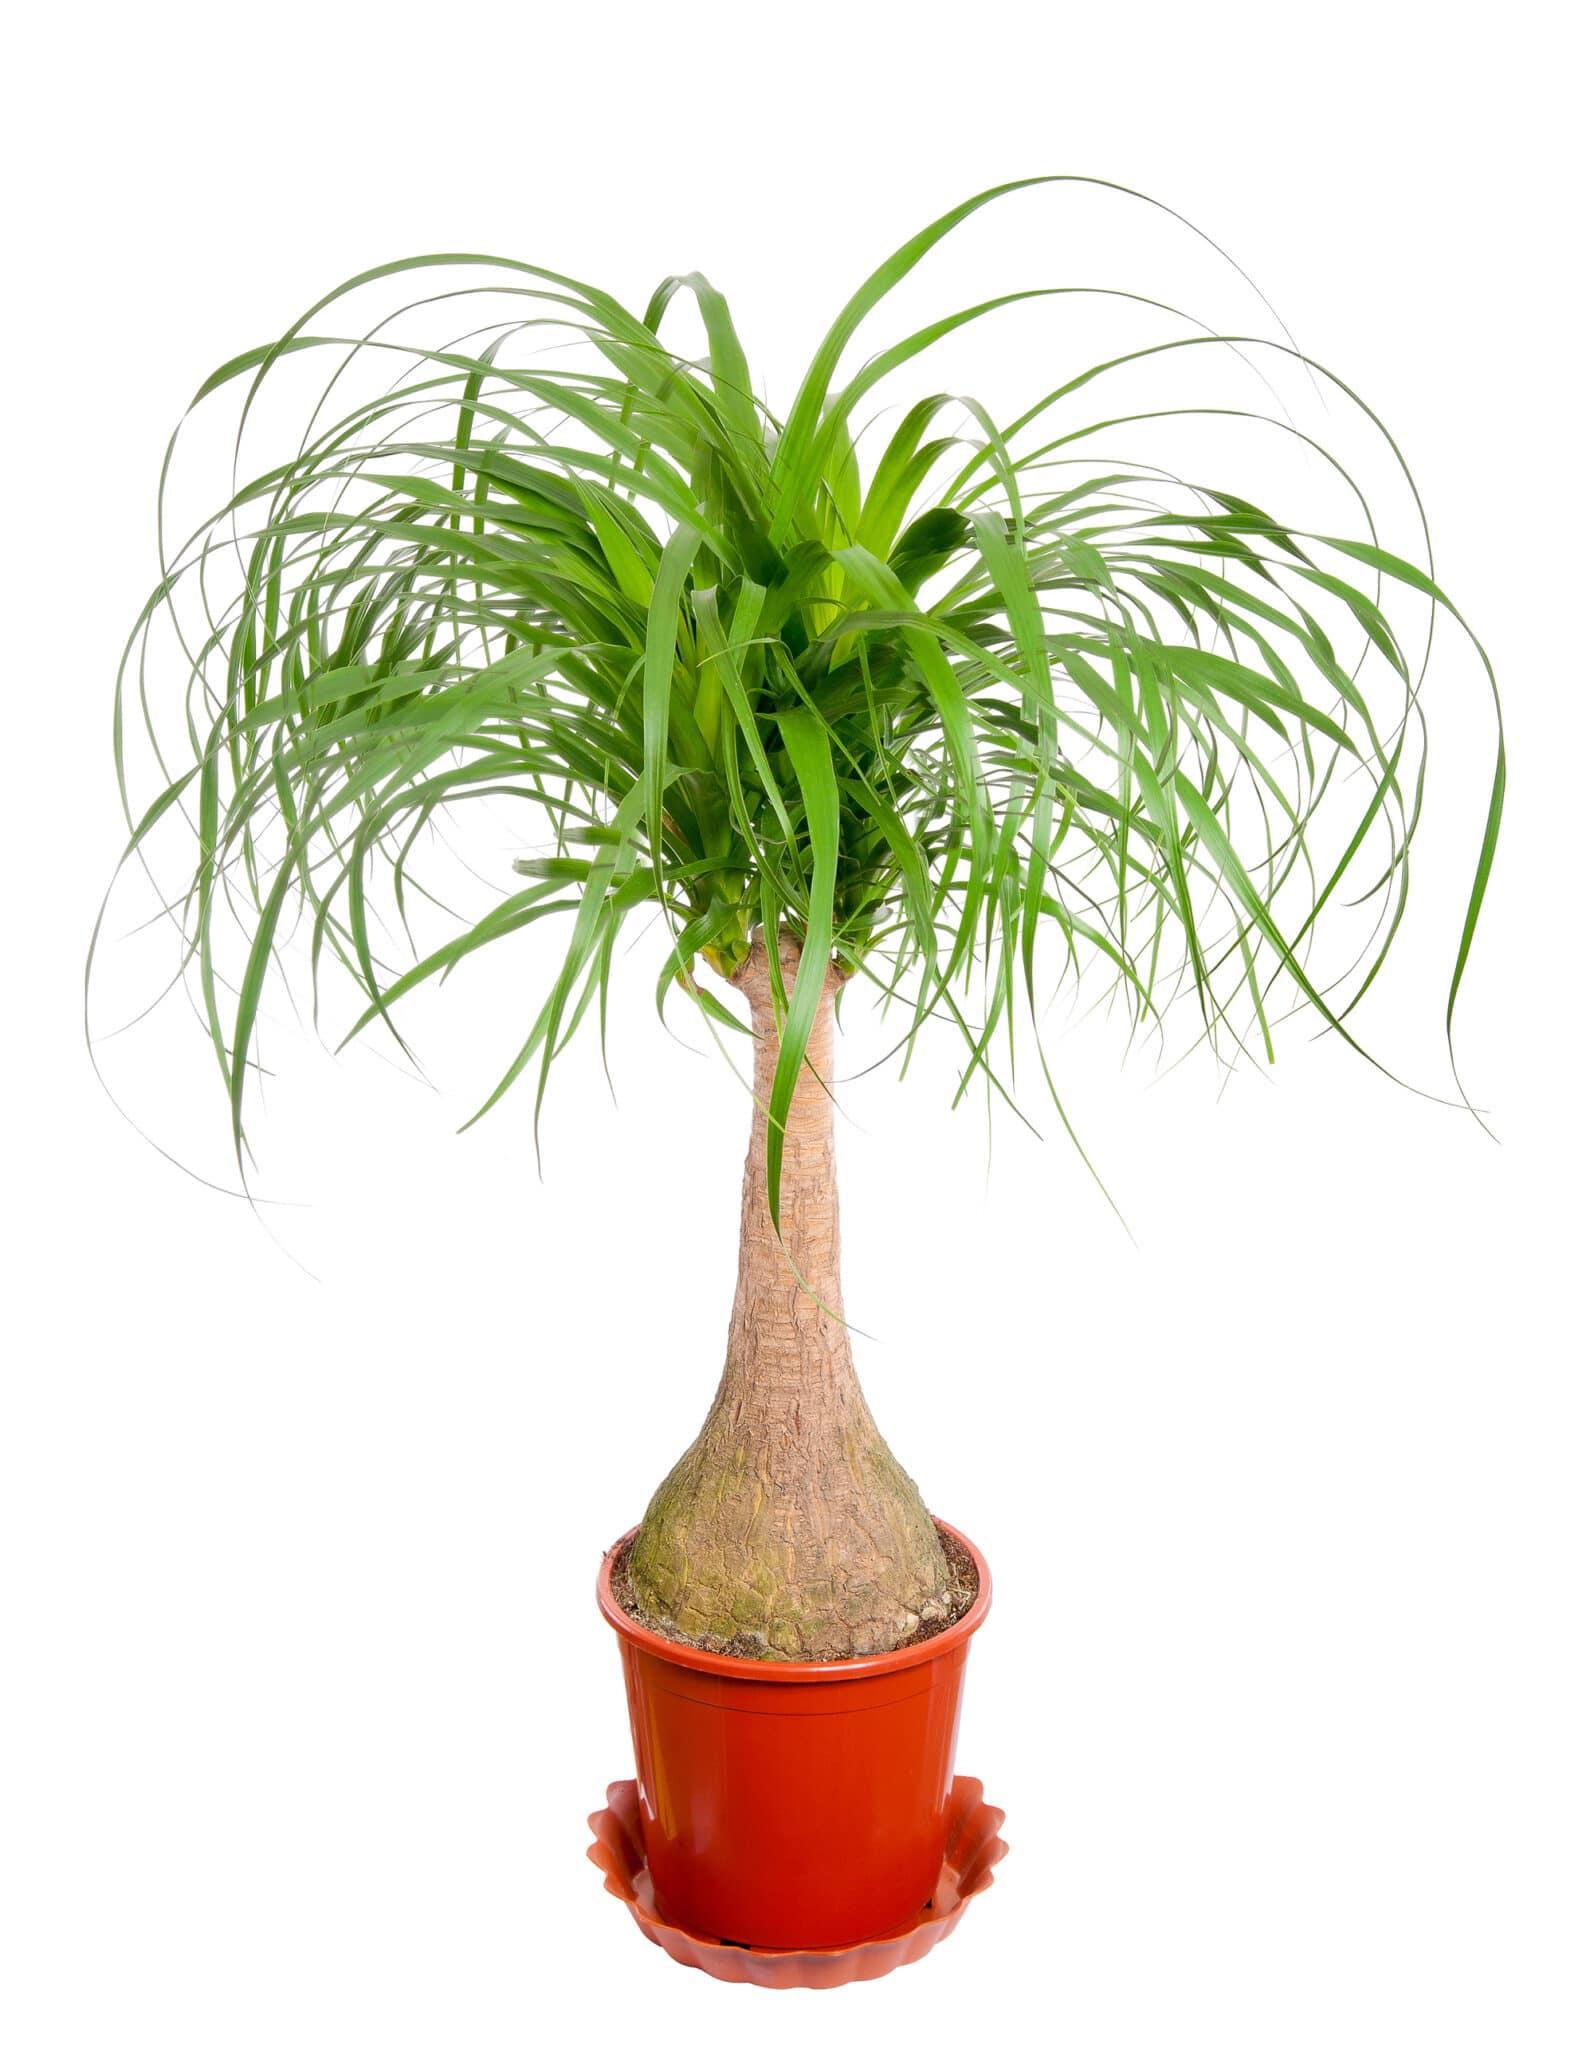 Pony tail palm in a pot.